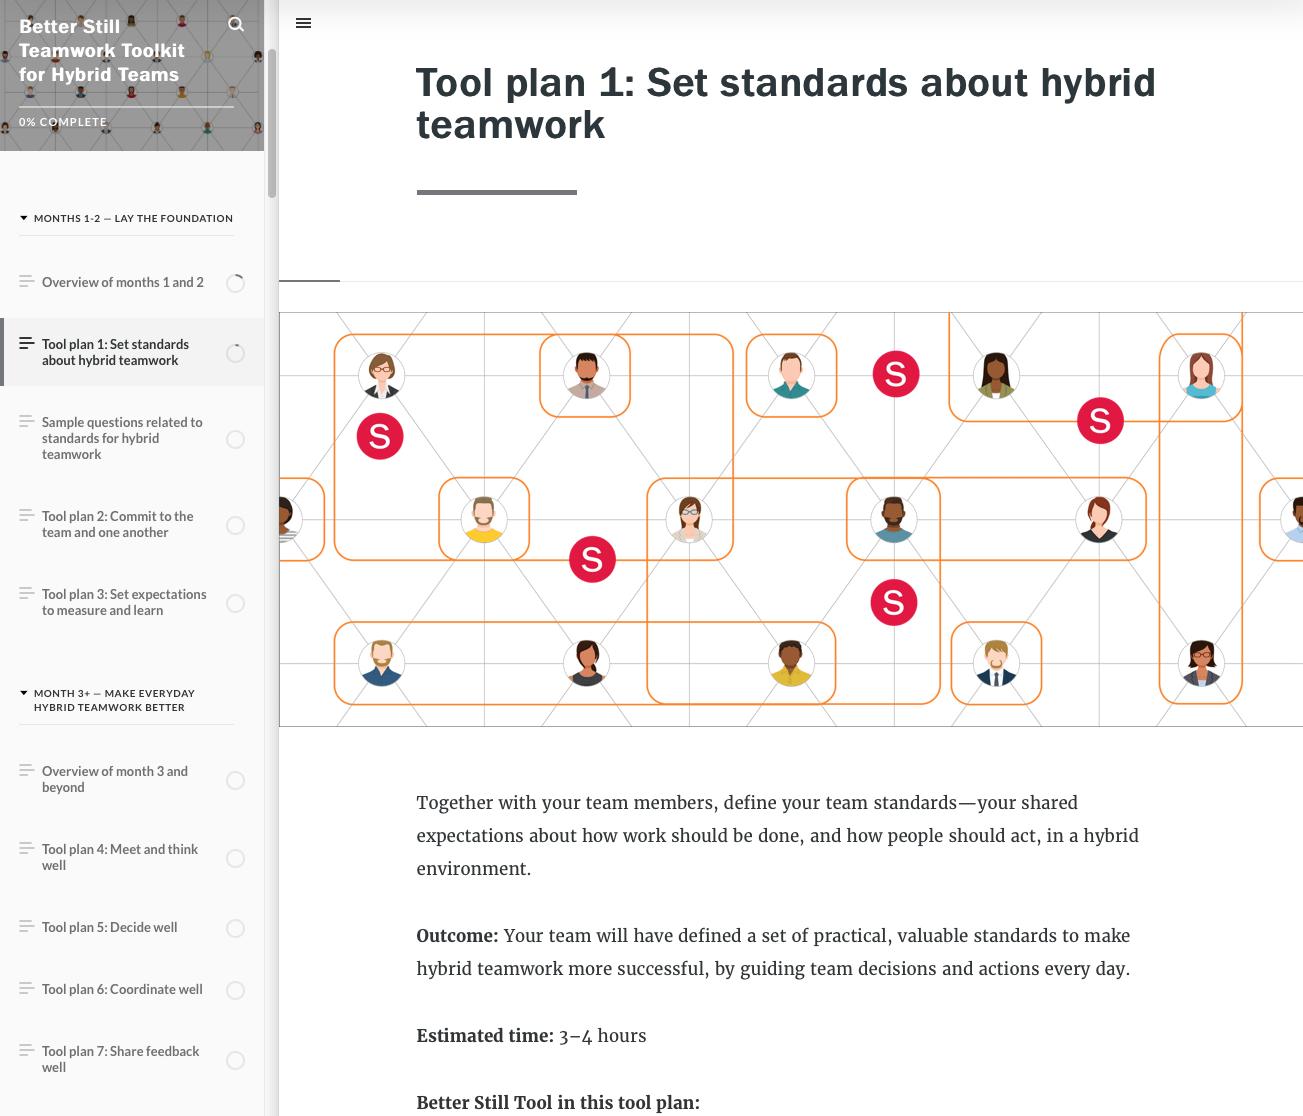 Better Still Teamwork Toolkit for Hybrid Teams Tool Plan Sample